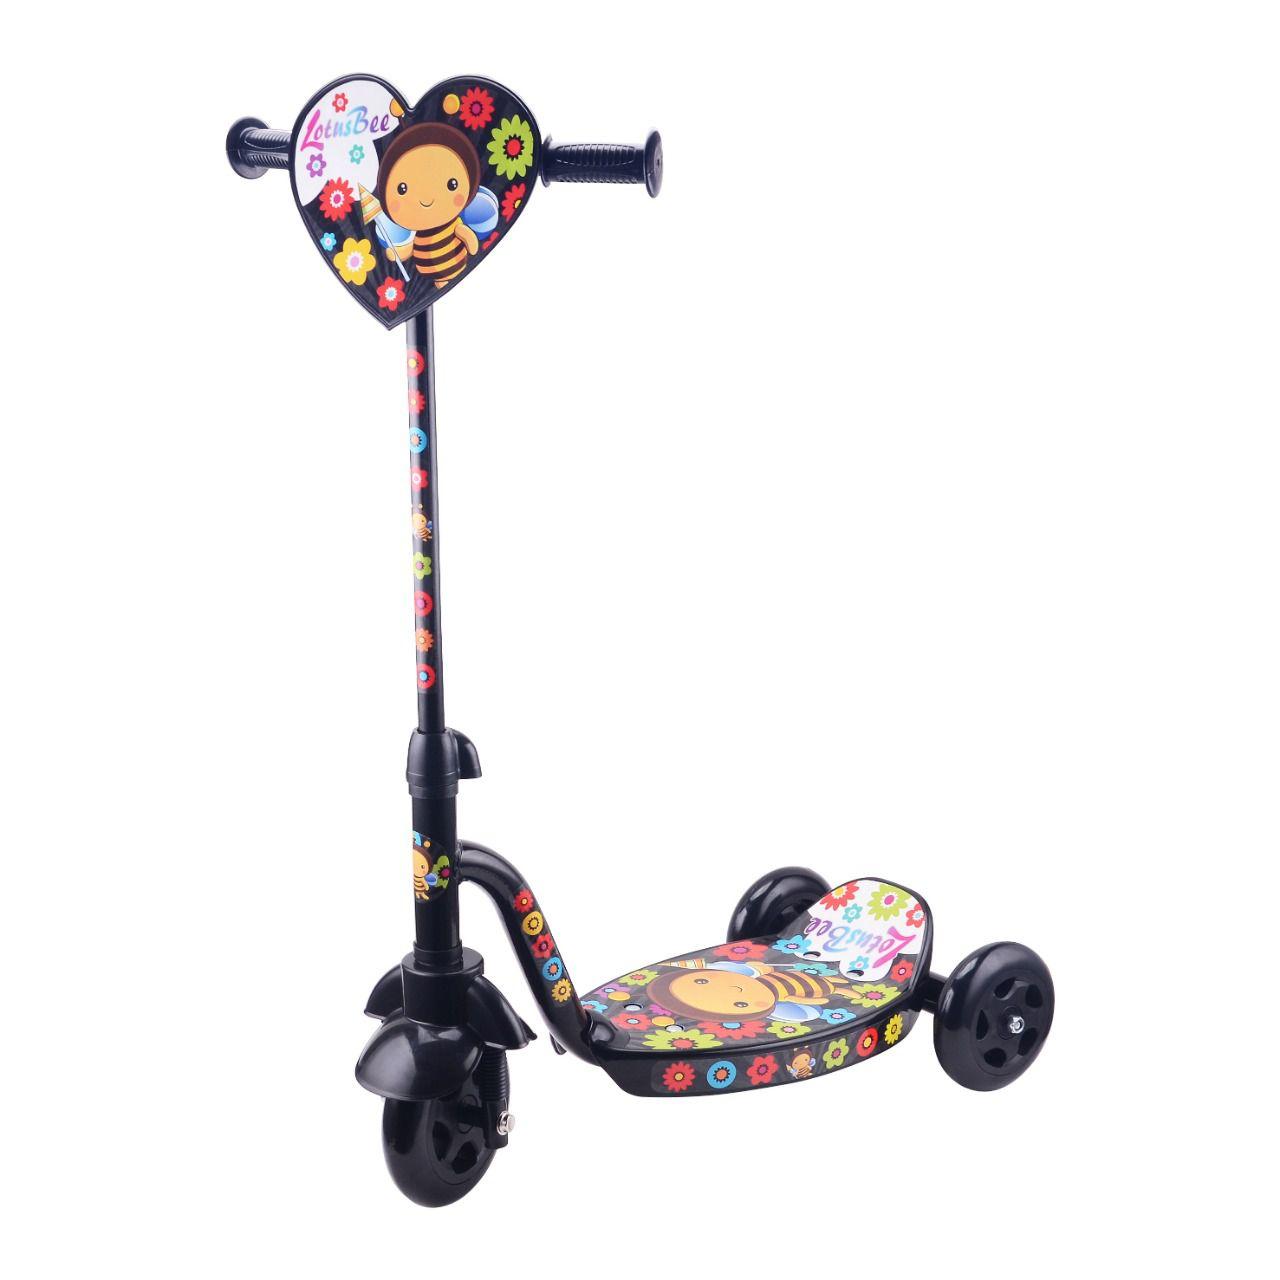 Patinete Infantil Preto Estampa Lotus Bee Personalizado Com 3 Rodas - YTT-06PR-LX